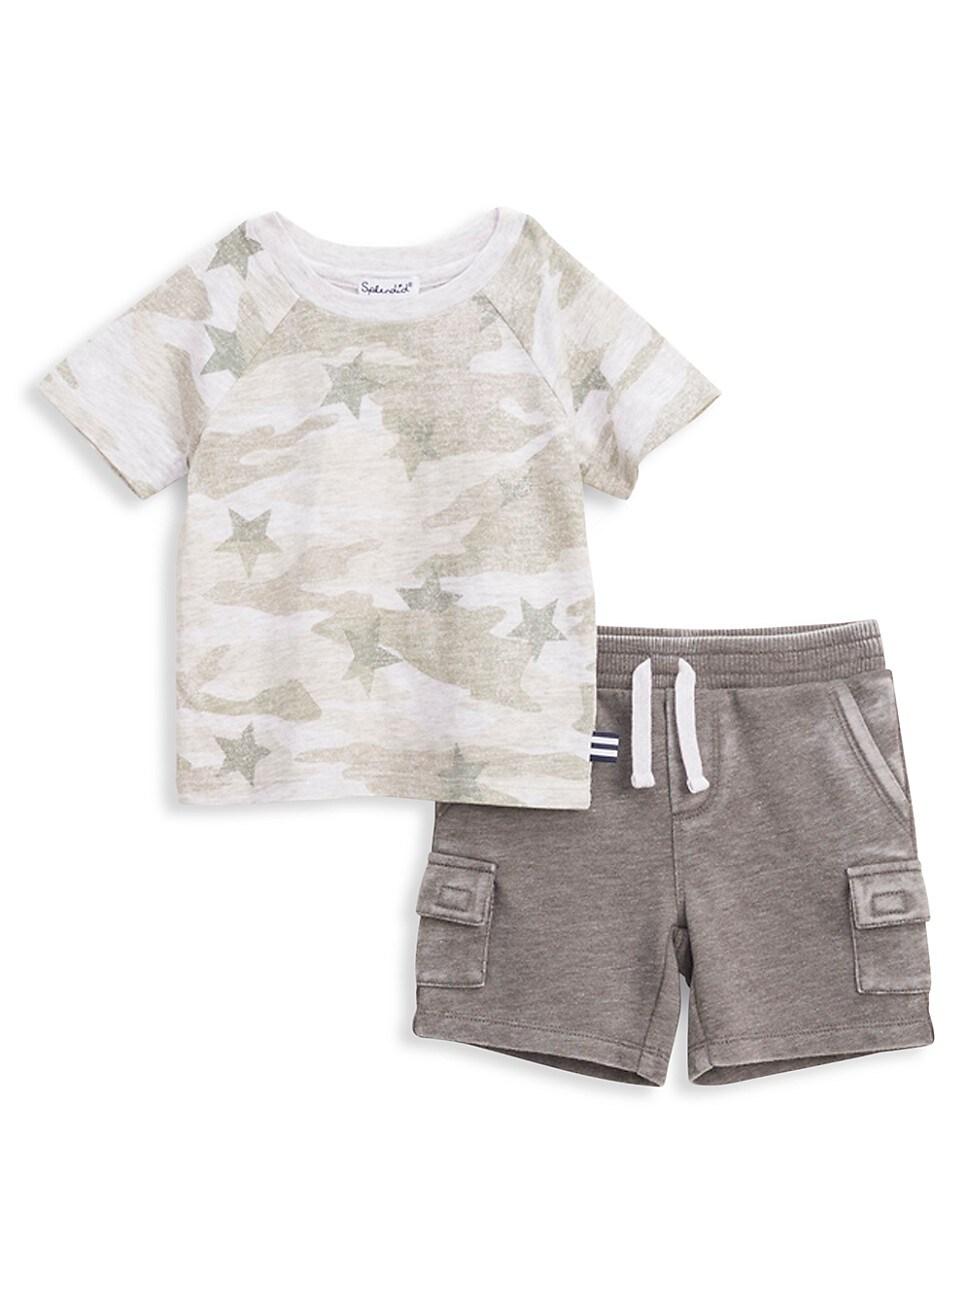 Splendid Sets BABY BOY'S 2-PIECE STAR CAMO T-SHIRT & SHORTS SET